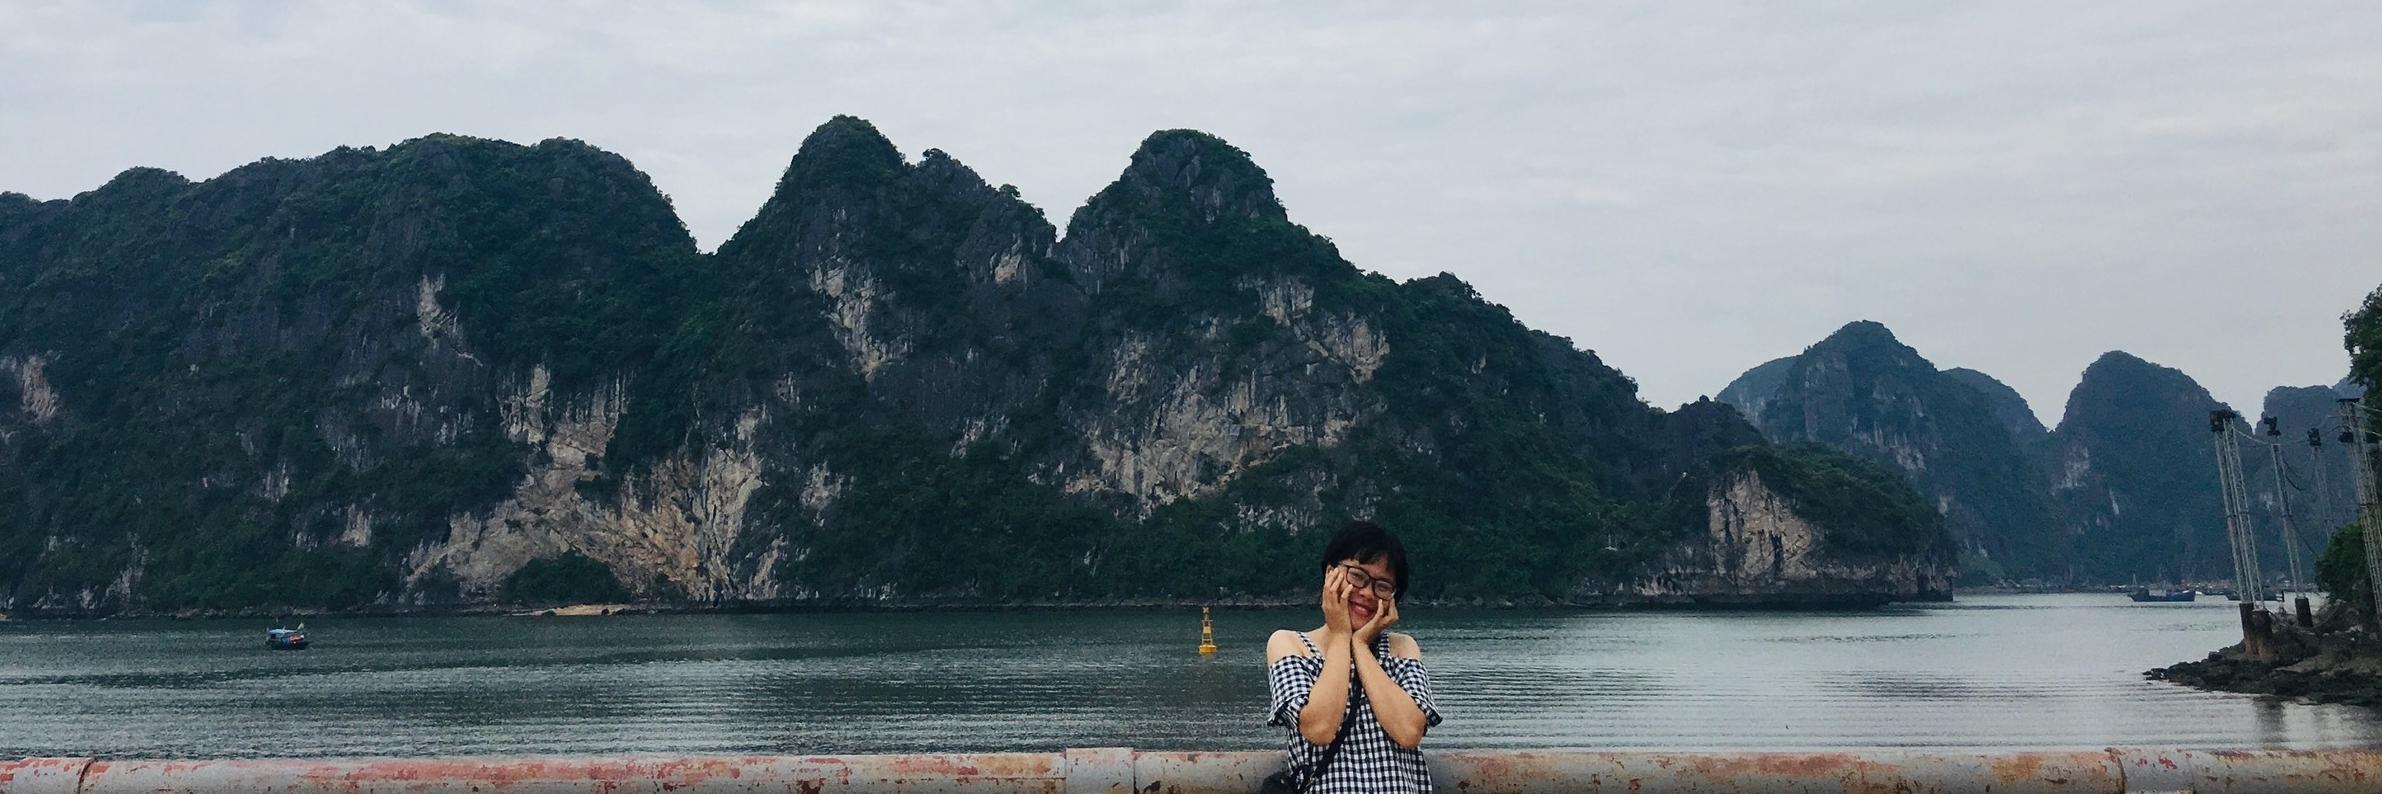 https://gody.vn/blog/dothihainhu27103837/post/cam-500k-di-quanh-ha-long-tin-duoc-khong-5732